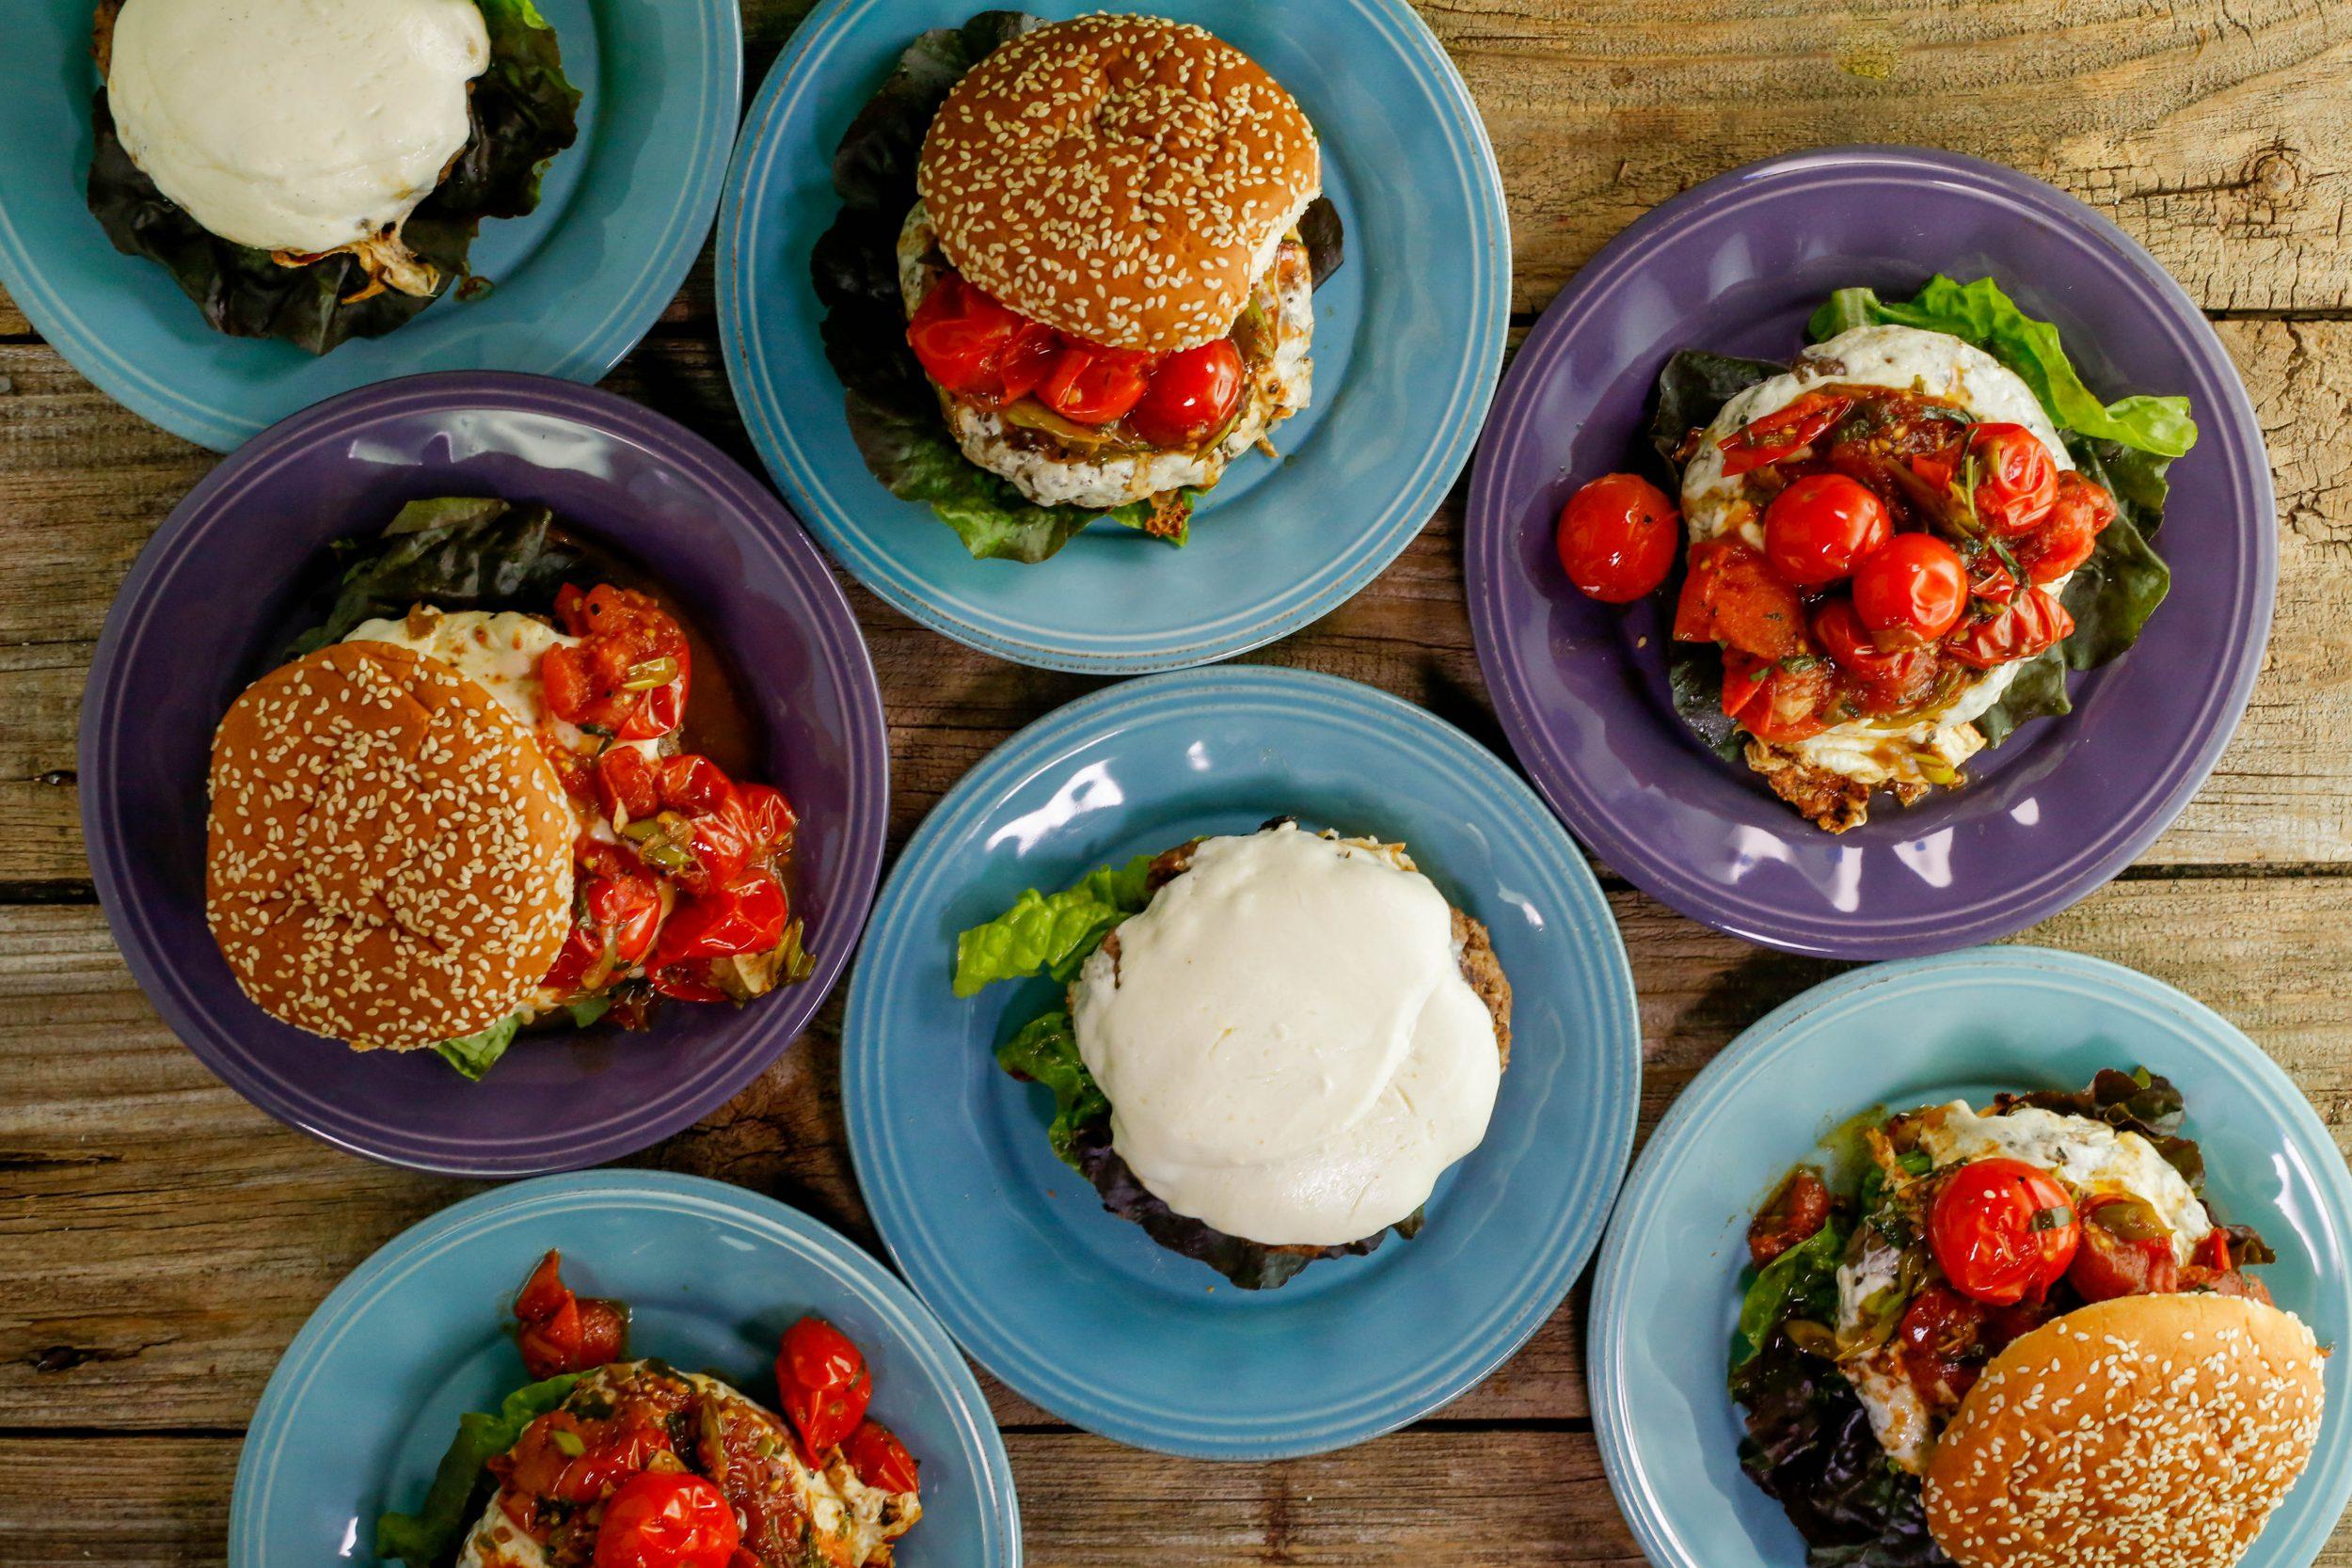 Green Onion Burgers with Burst Tomato-Tarragon Sauce